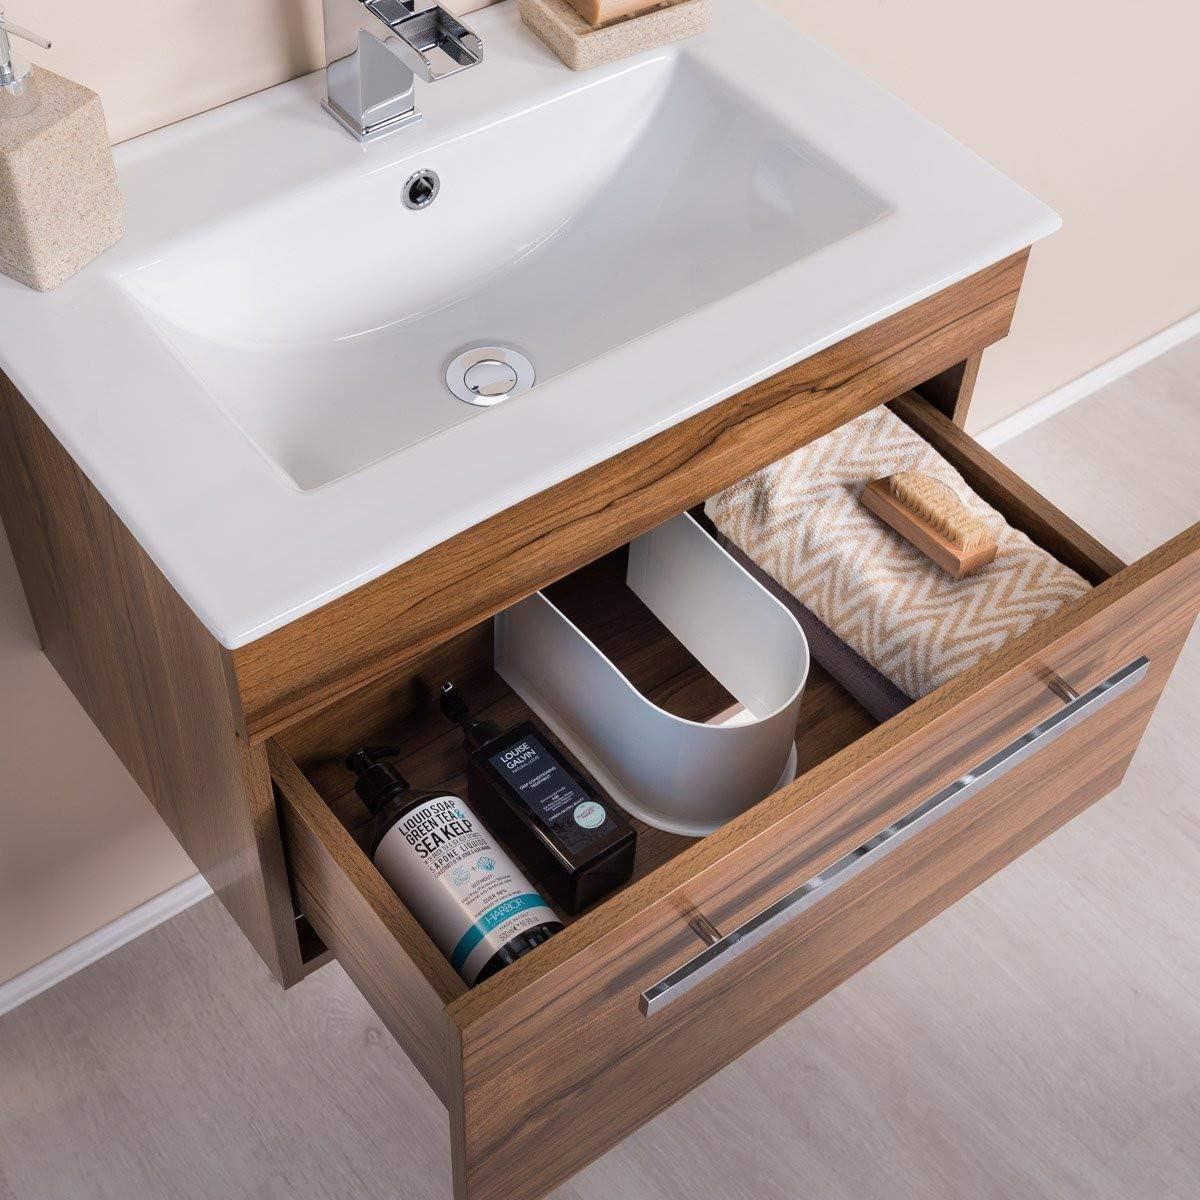 NRG Walnut 600mm Wall Hung Vanity Sink Unit Drawer Basin Bathroom Furniture